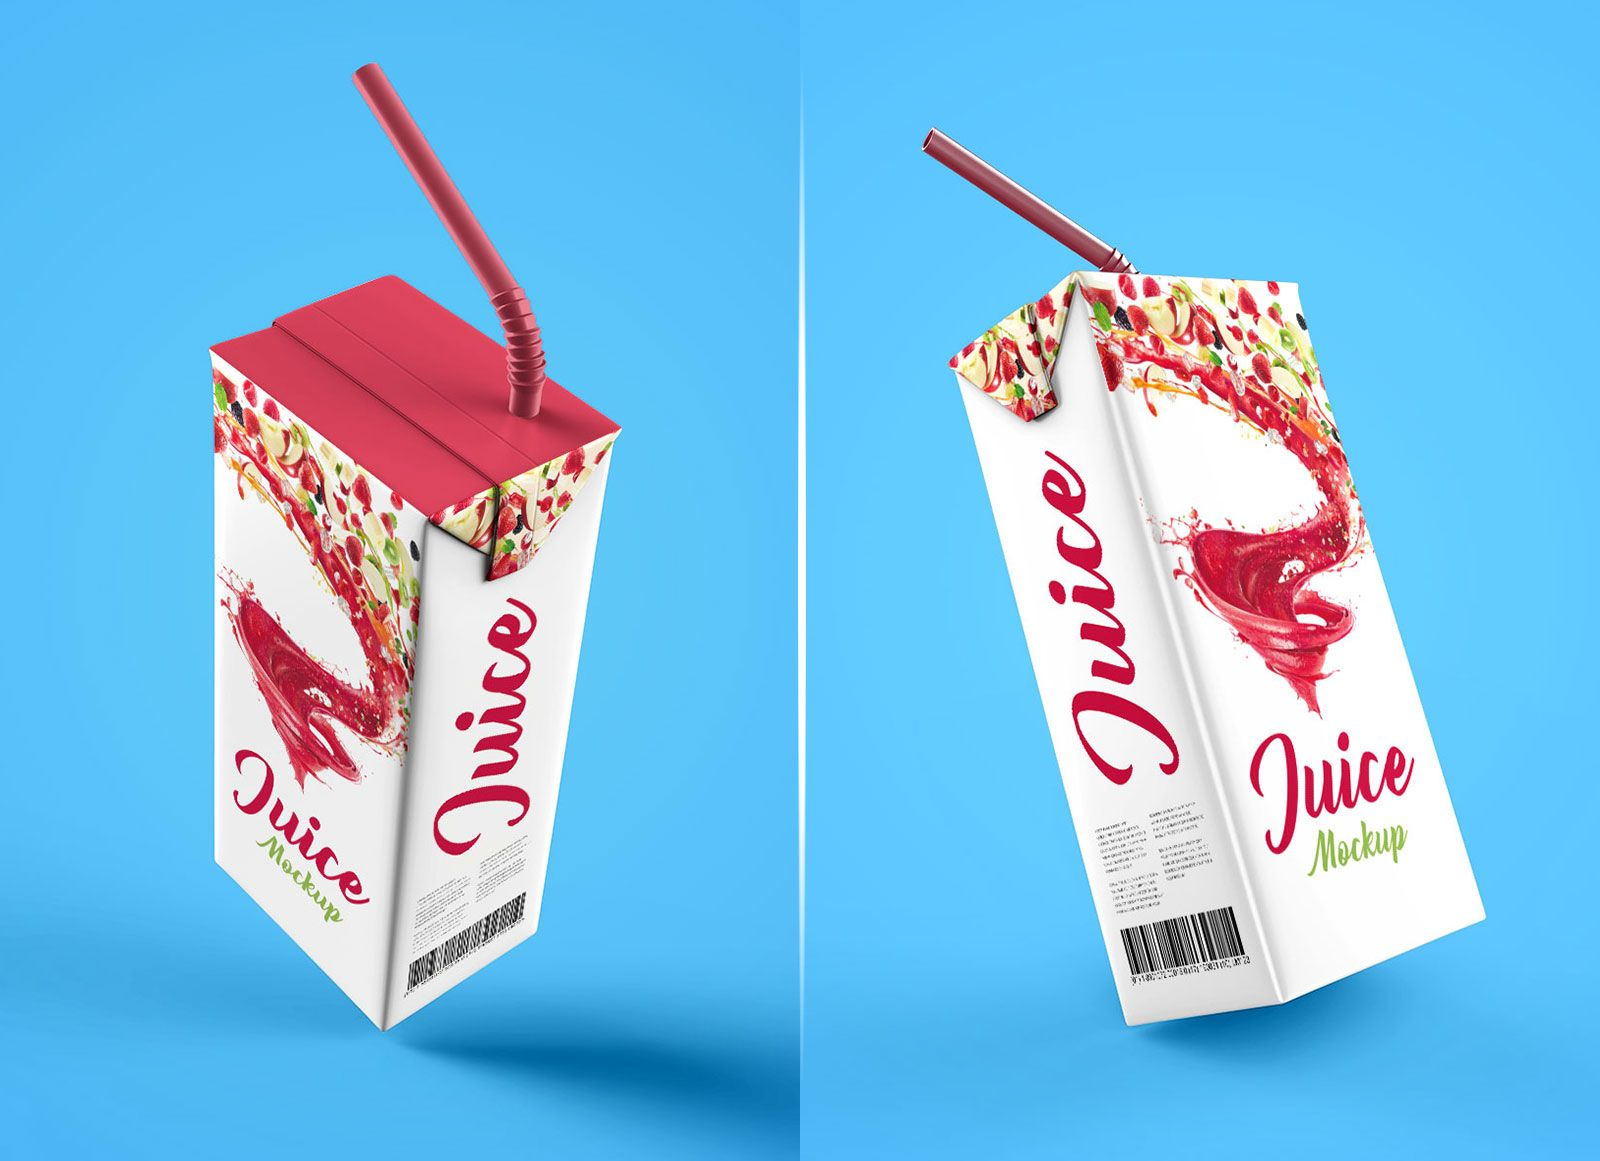 Download Free Juice Box Packaging Mockup Psd Set Packaging Mockup Box Packaging Juice Boxes